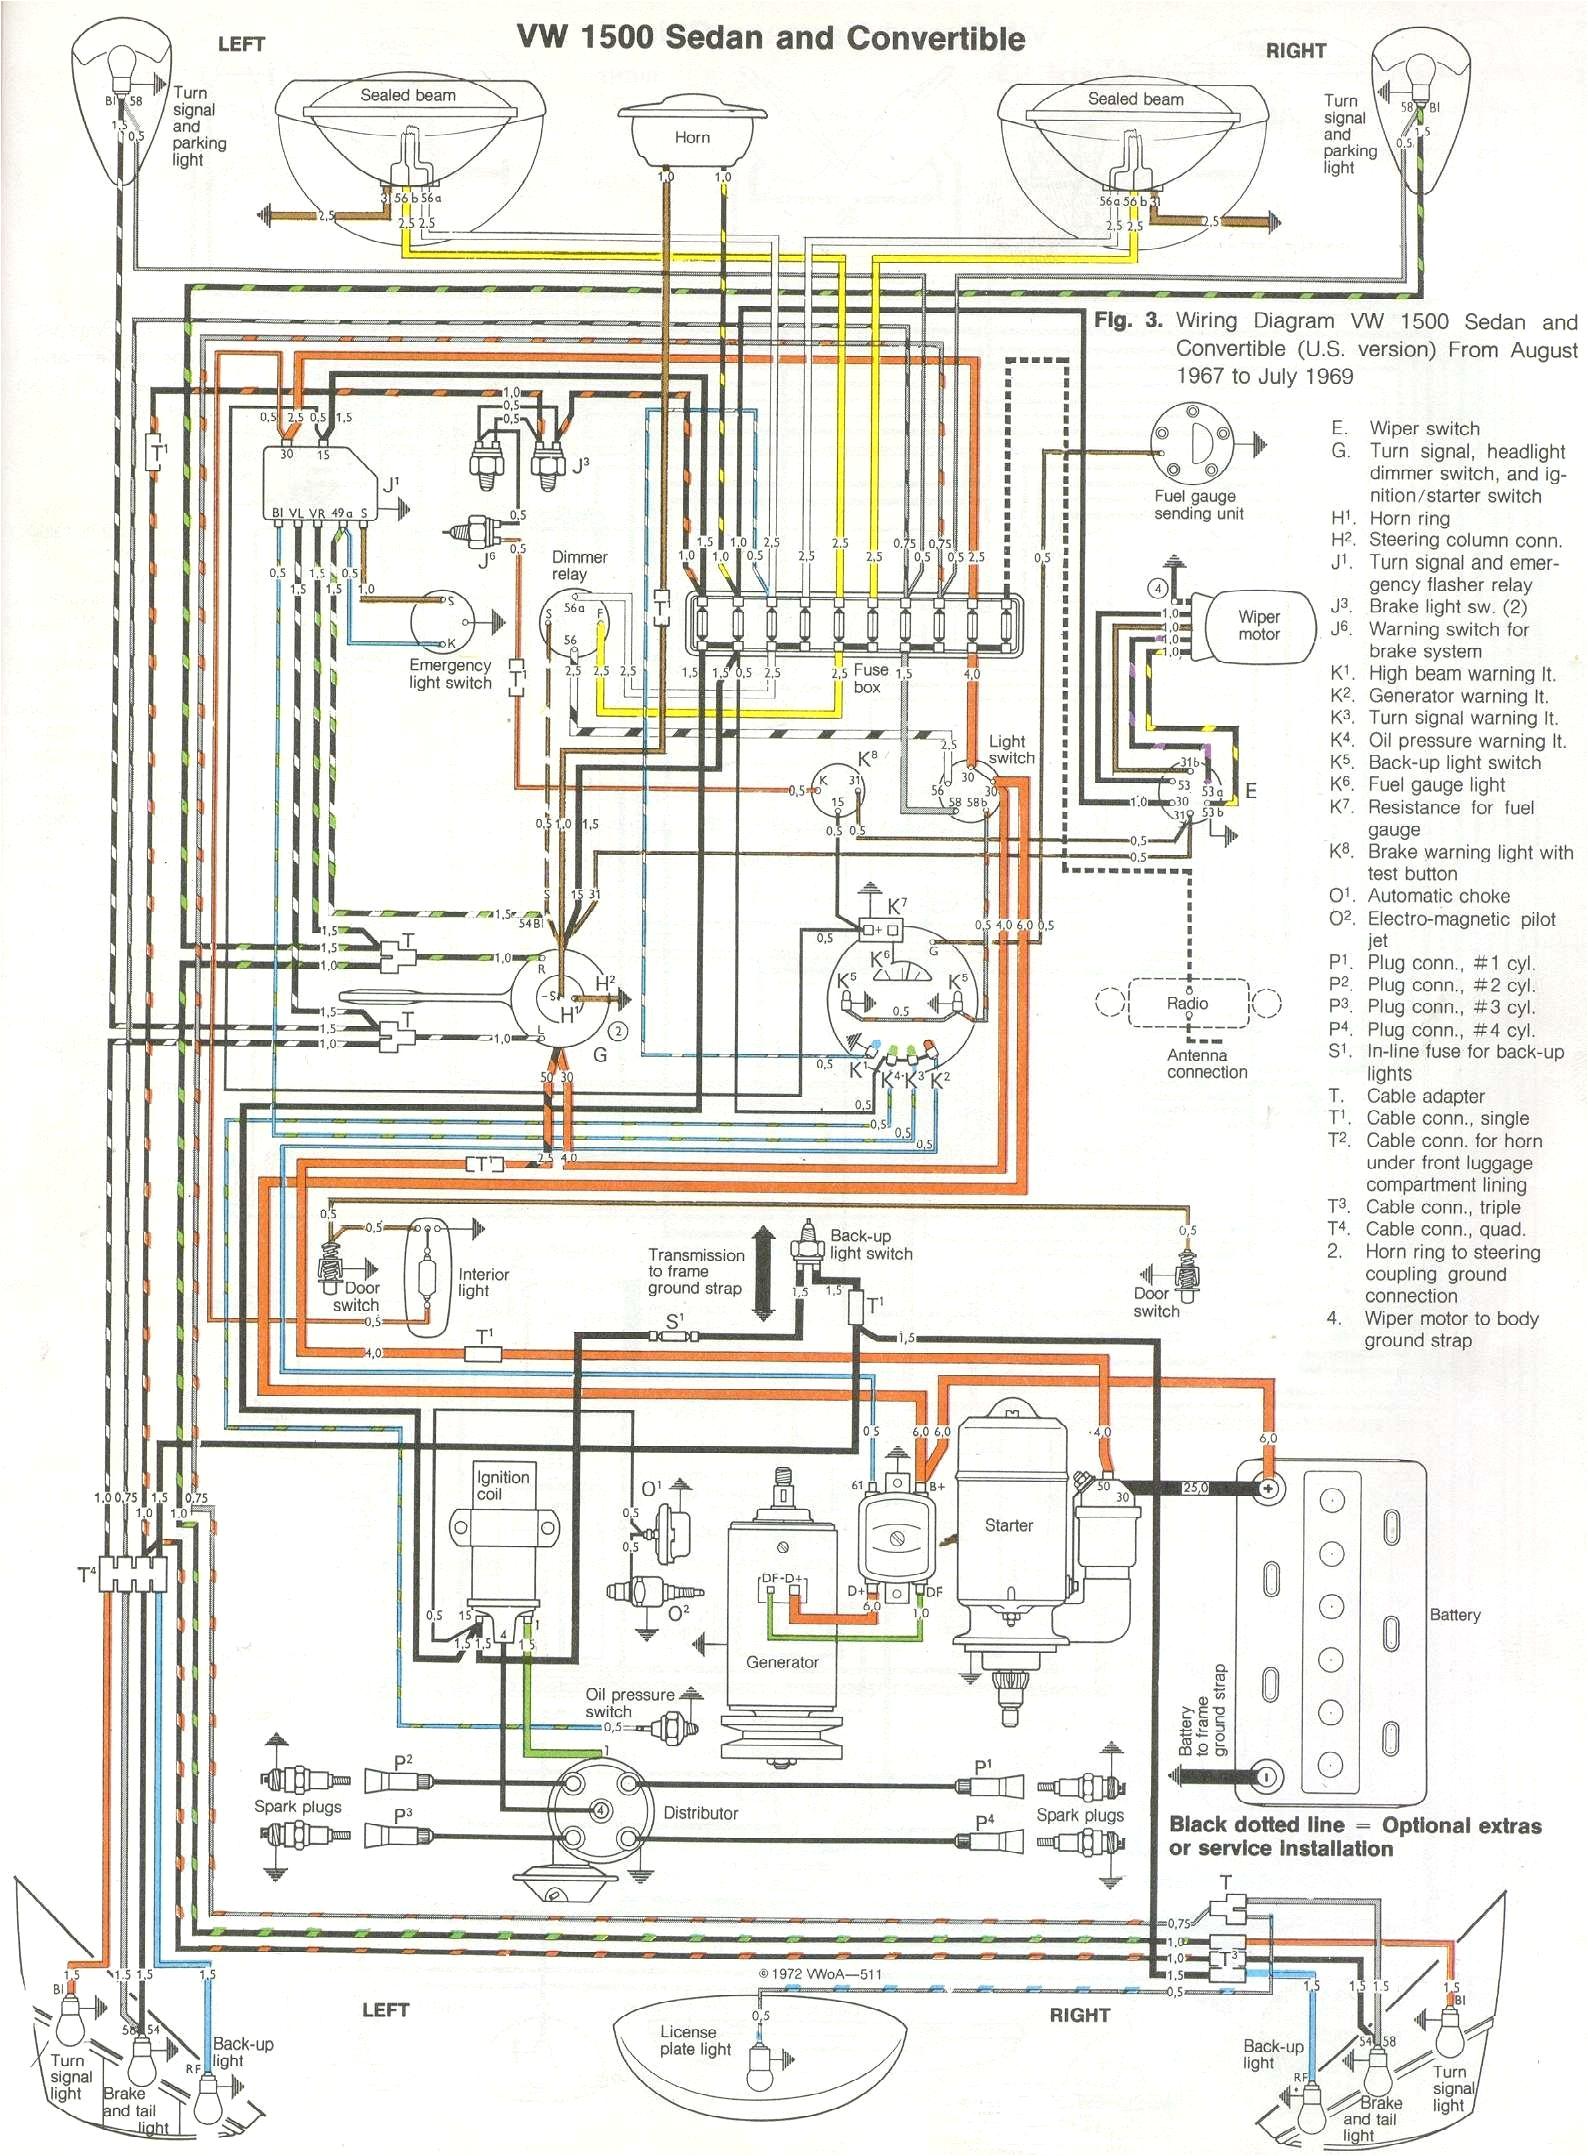 1967 Vw Beetle Wiring Diagram 68 Vw Wiring Diagram Wiring Diagram Paper